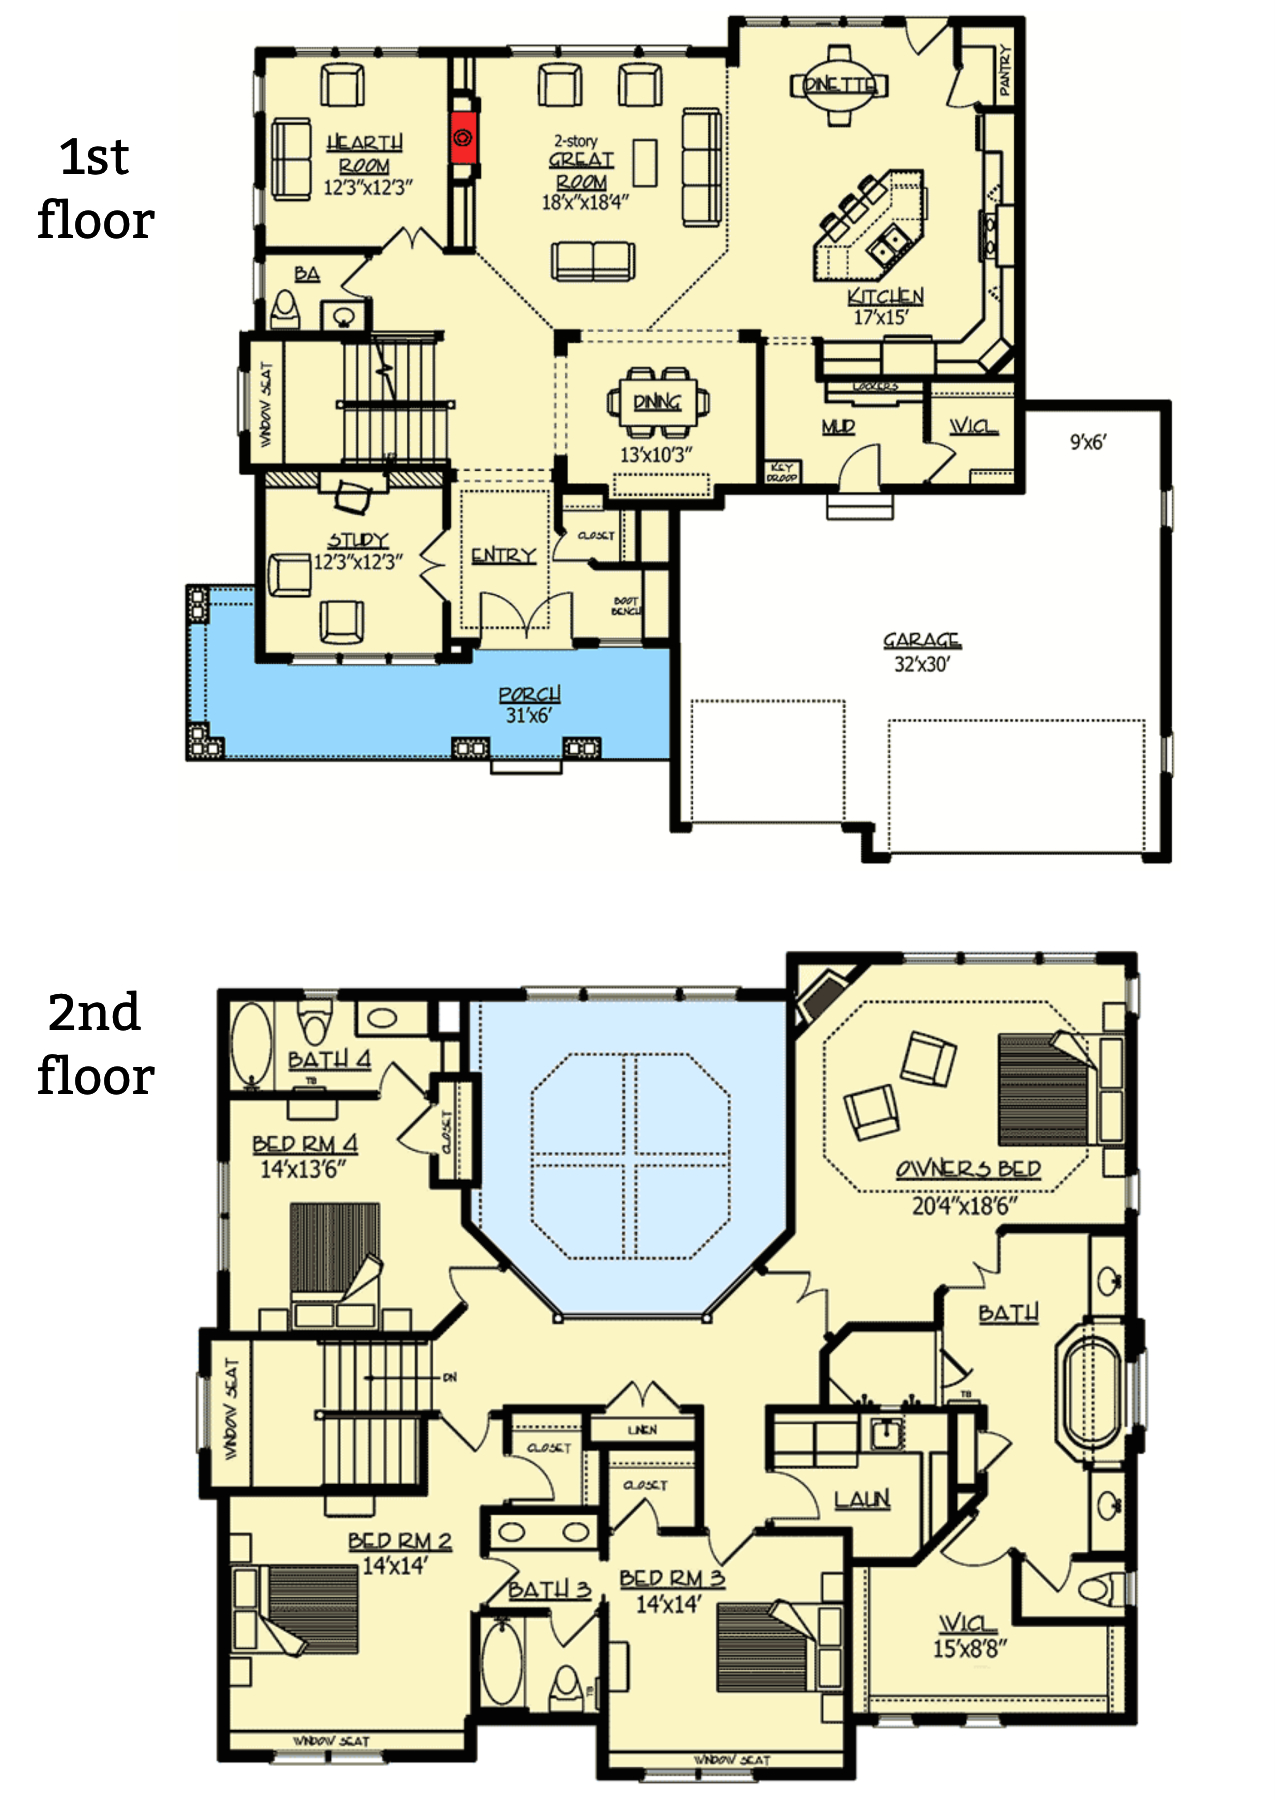 The Lone Star Floor plan